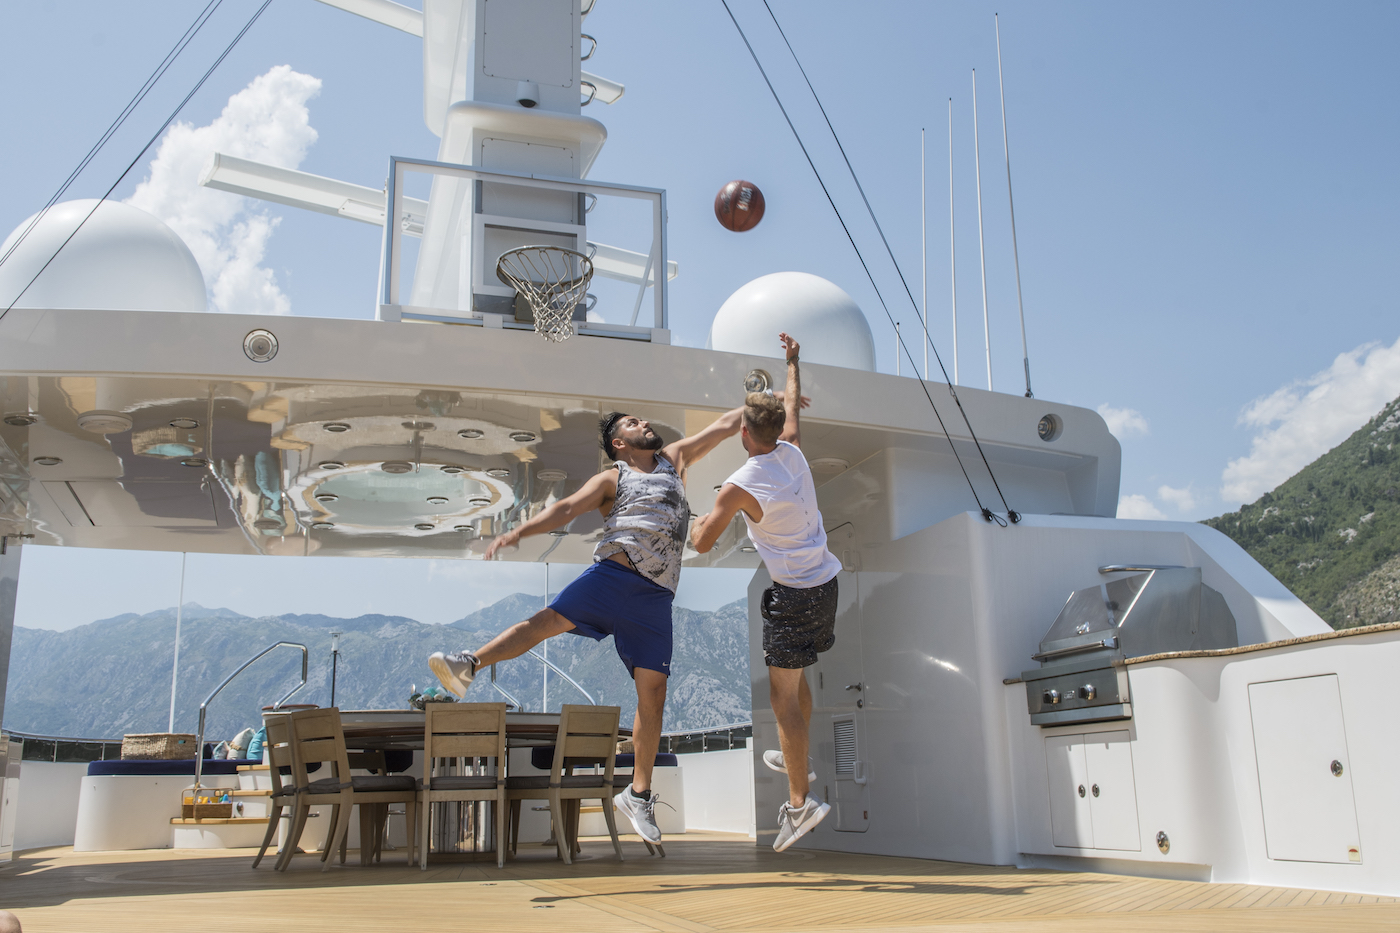 Playing Basketball On Deck Of Yacht Skyfall